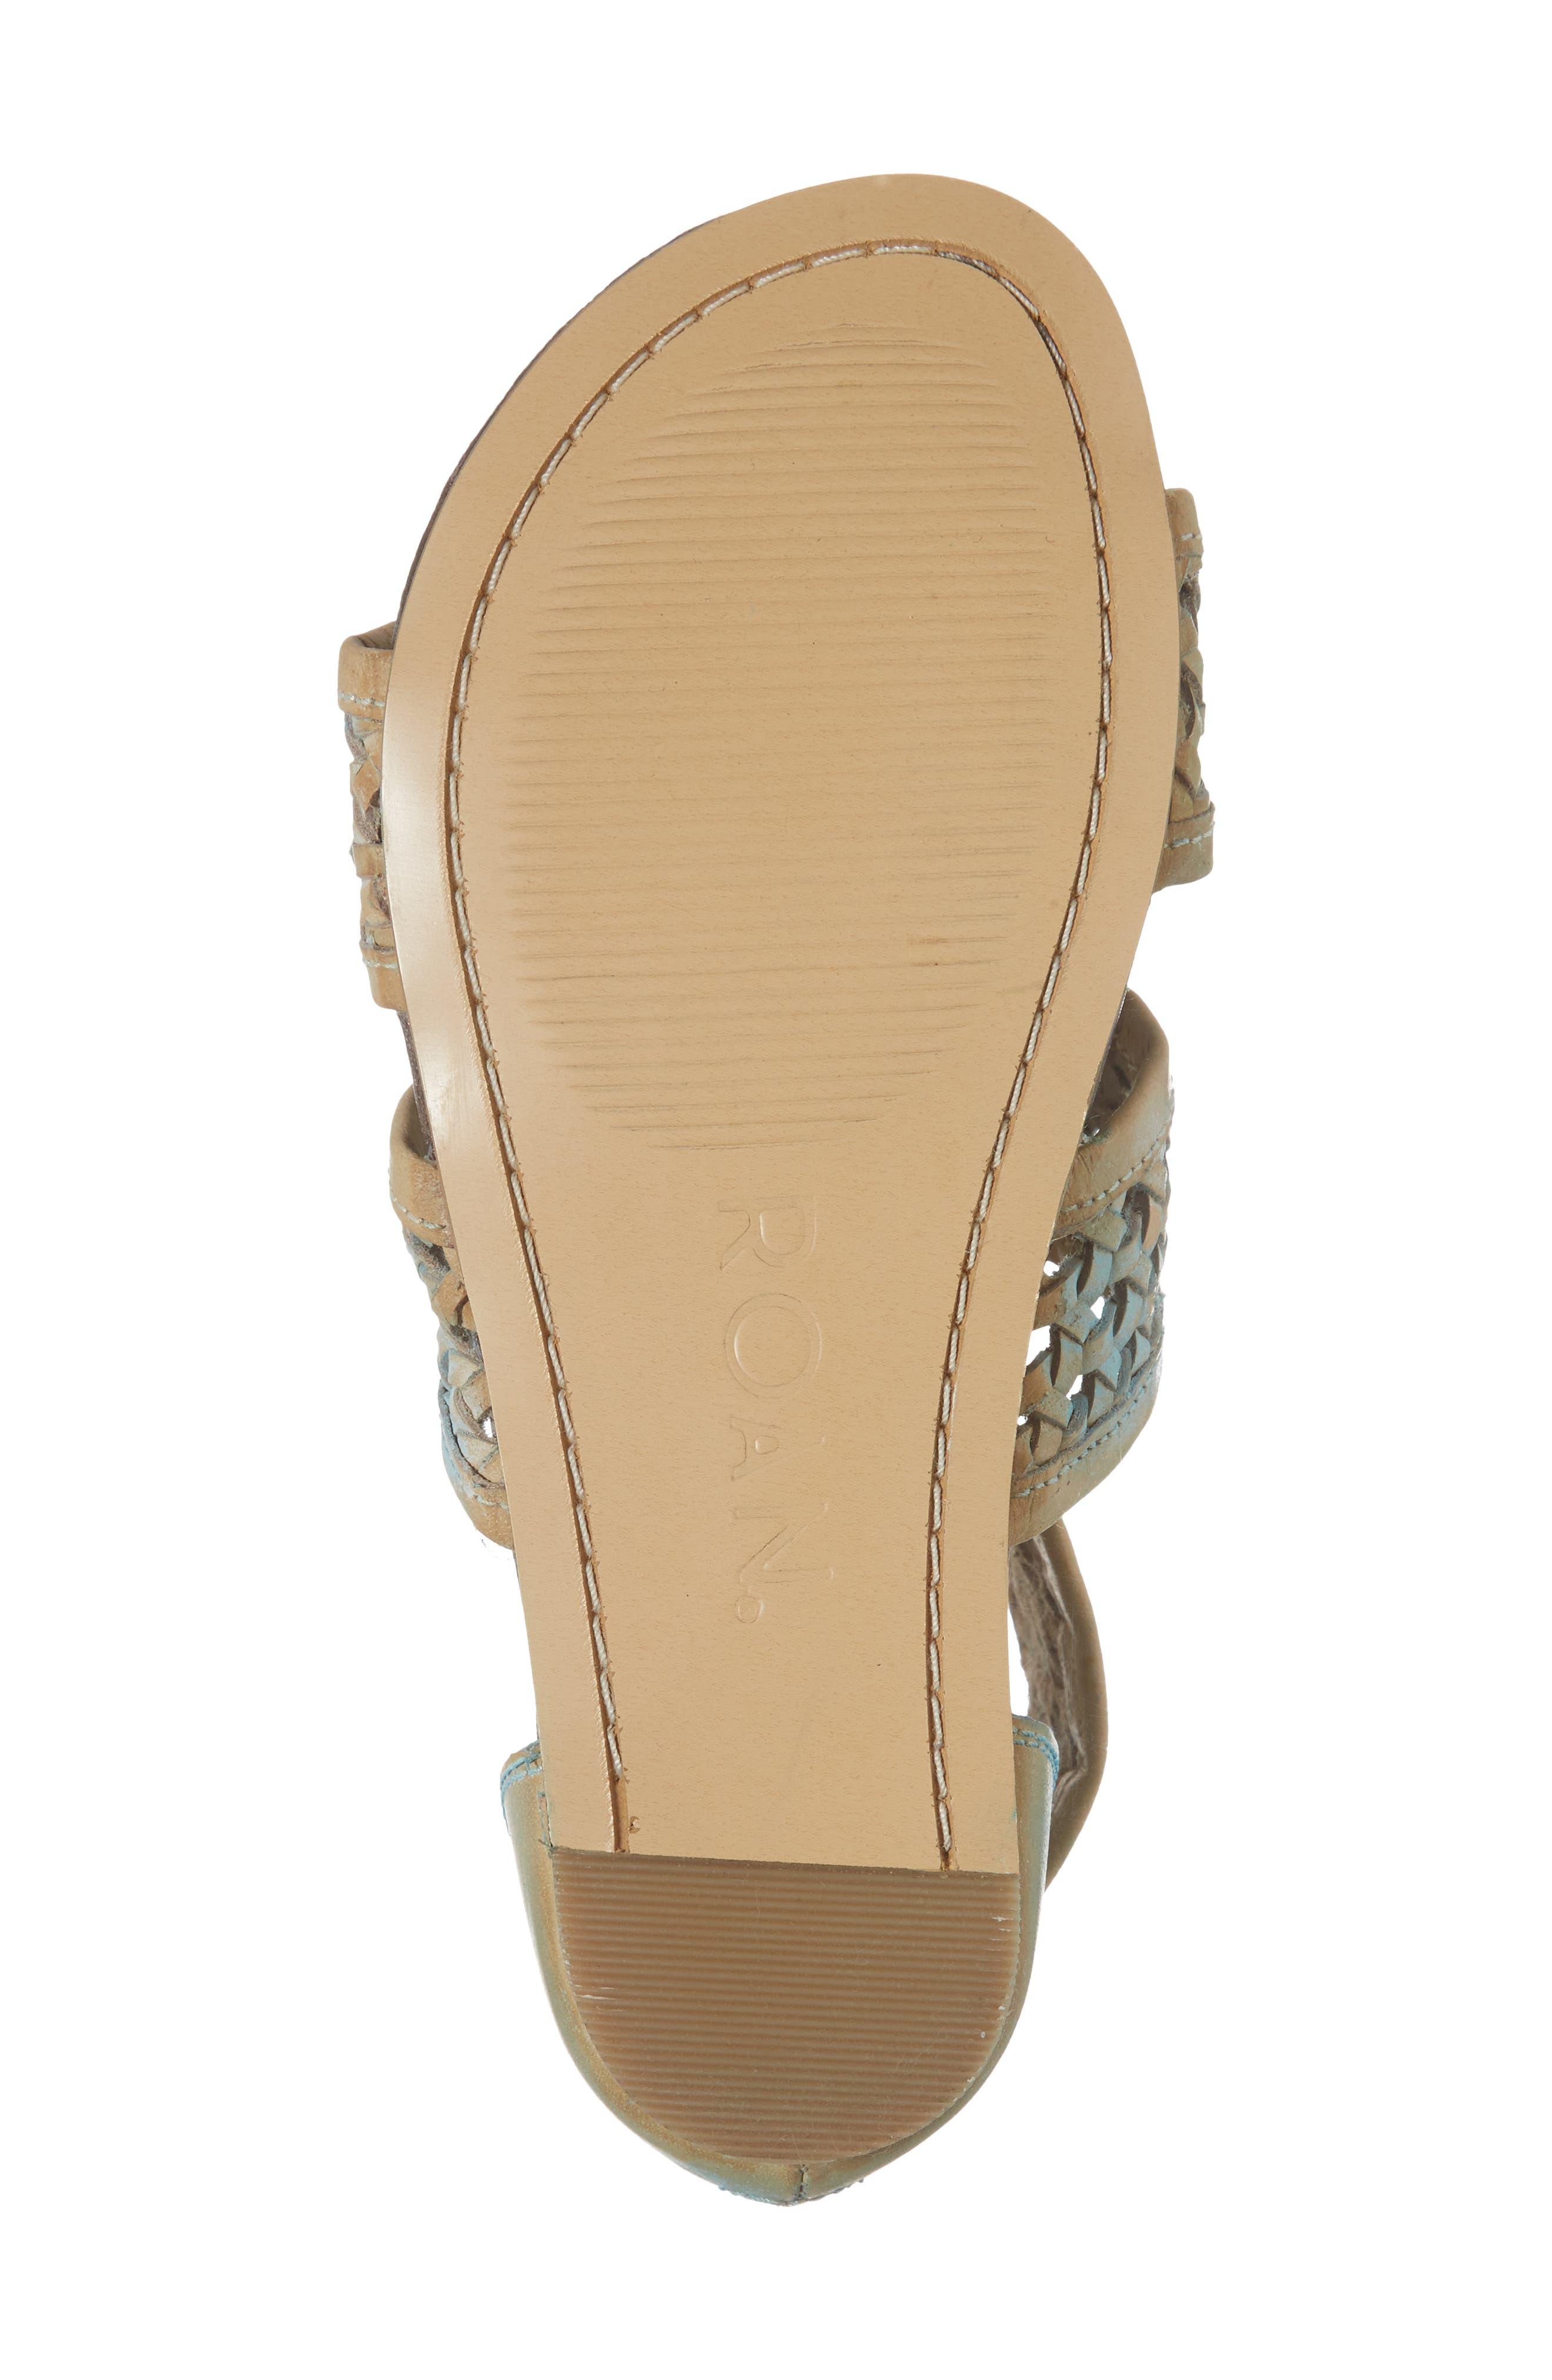 Clio Woven Ankle Cuff Sandal,                             Alternate thumbnail 6, color,                             Blue